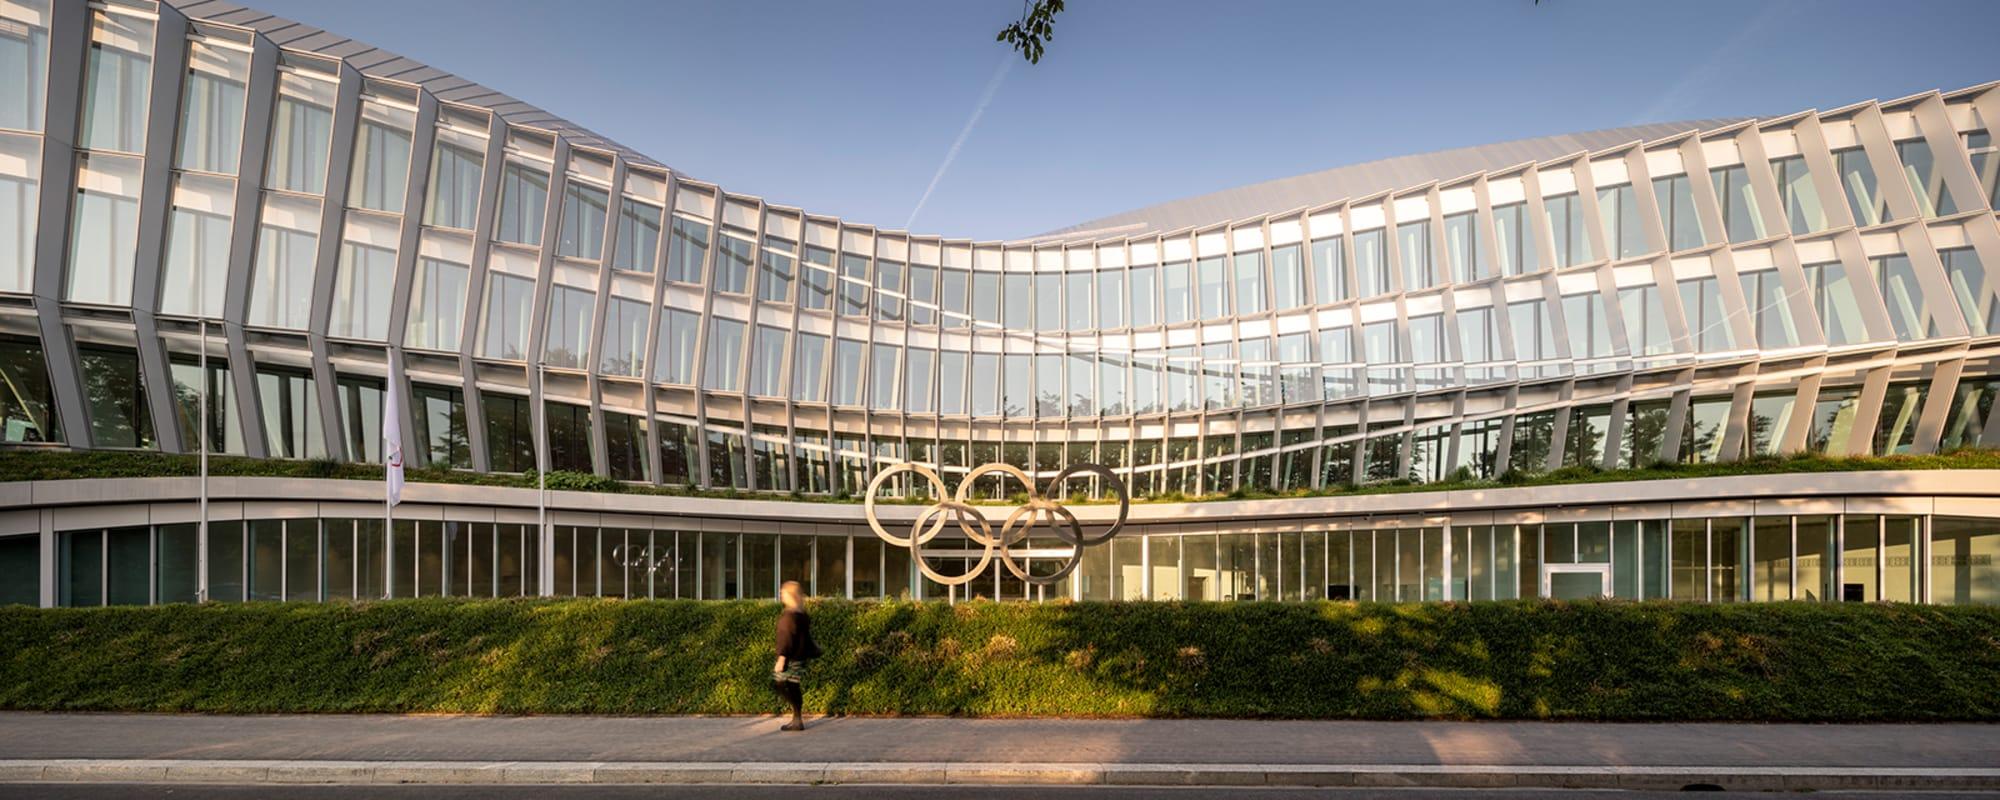 IOC, Architektur, Neubau